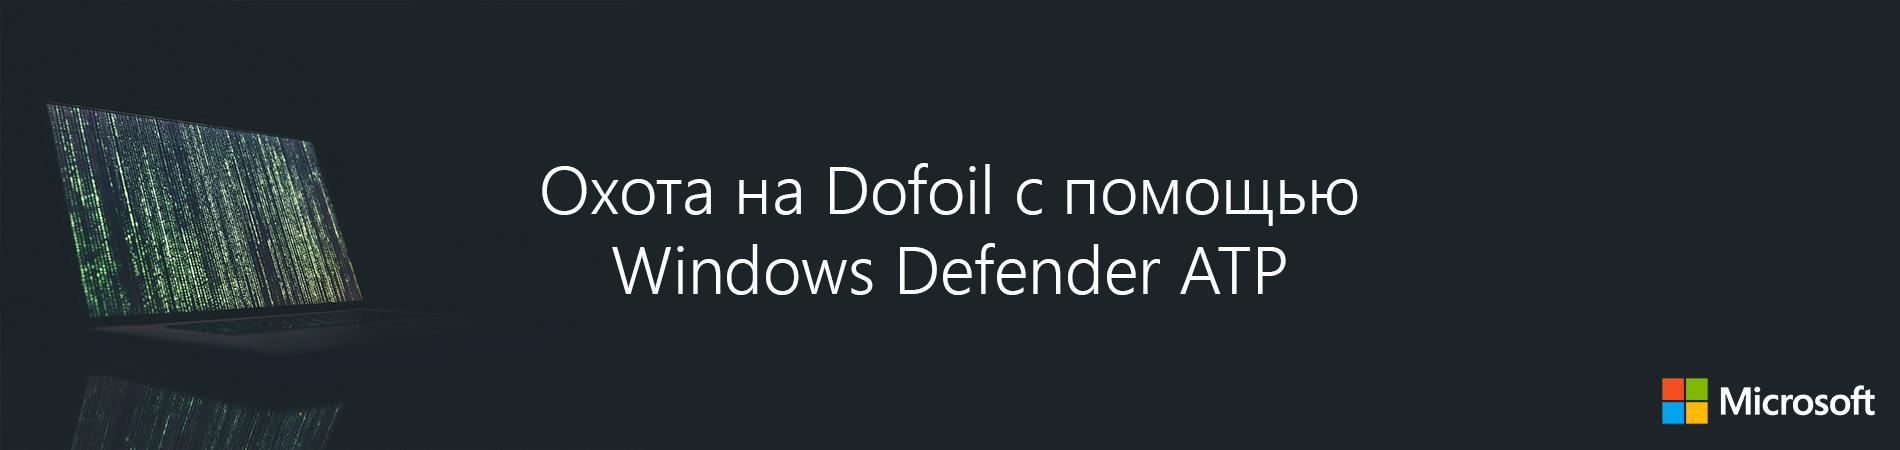 Hunting for Dofoil using Windows Defender ATP